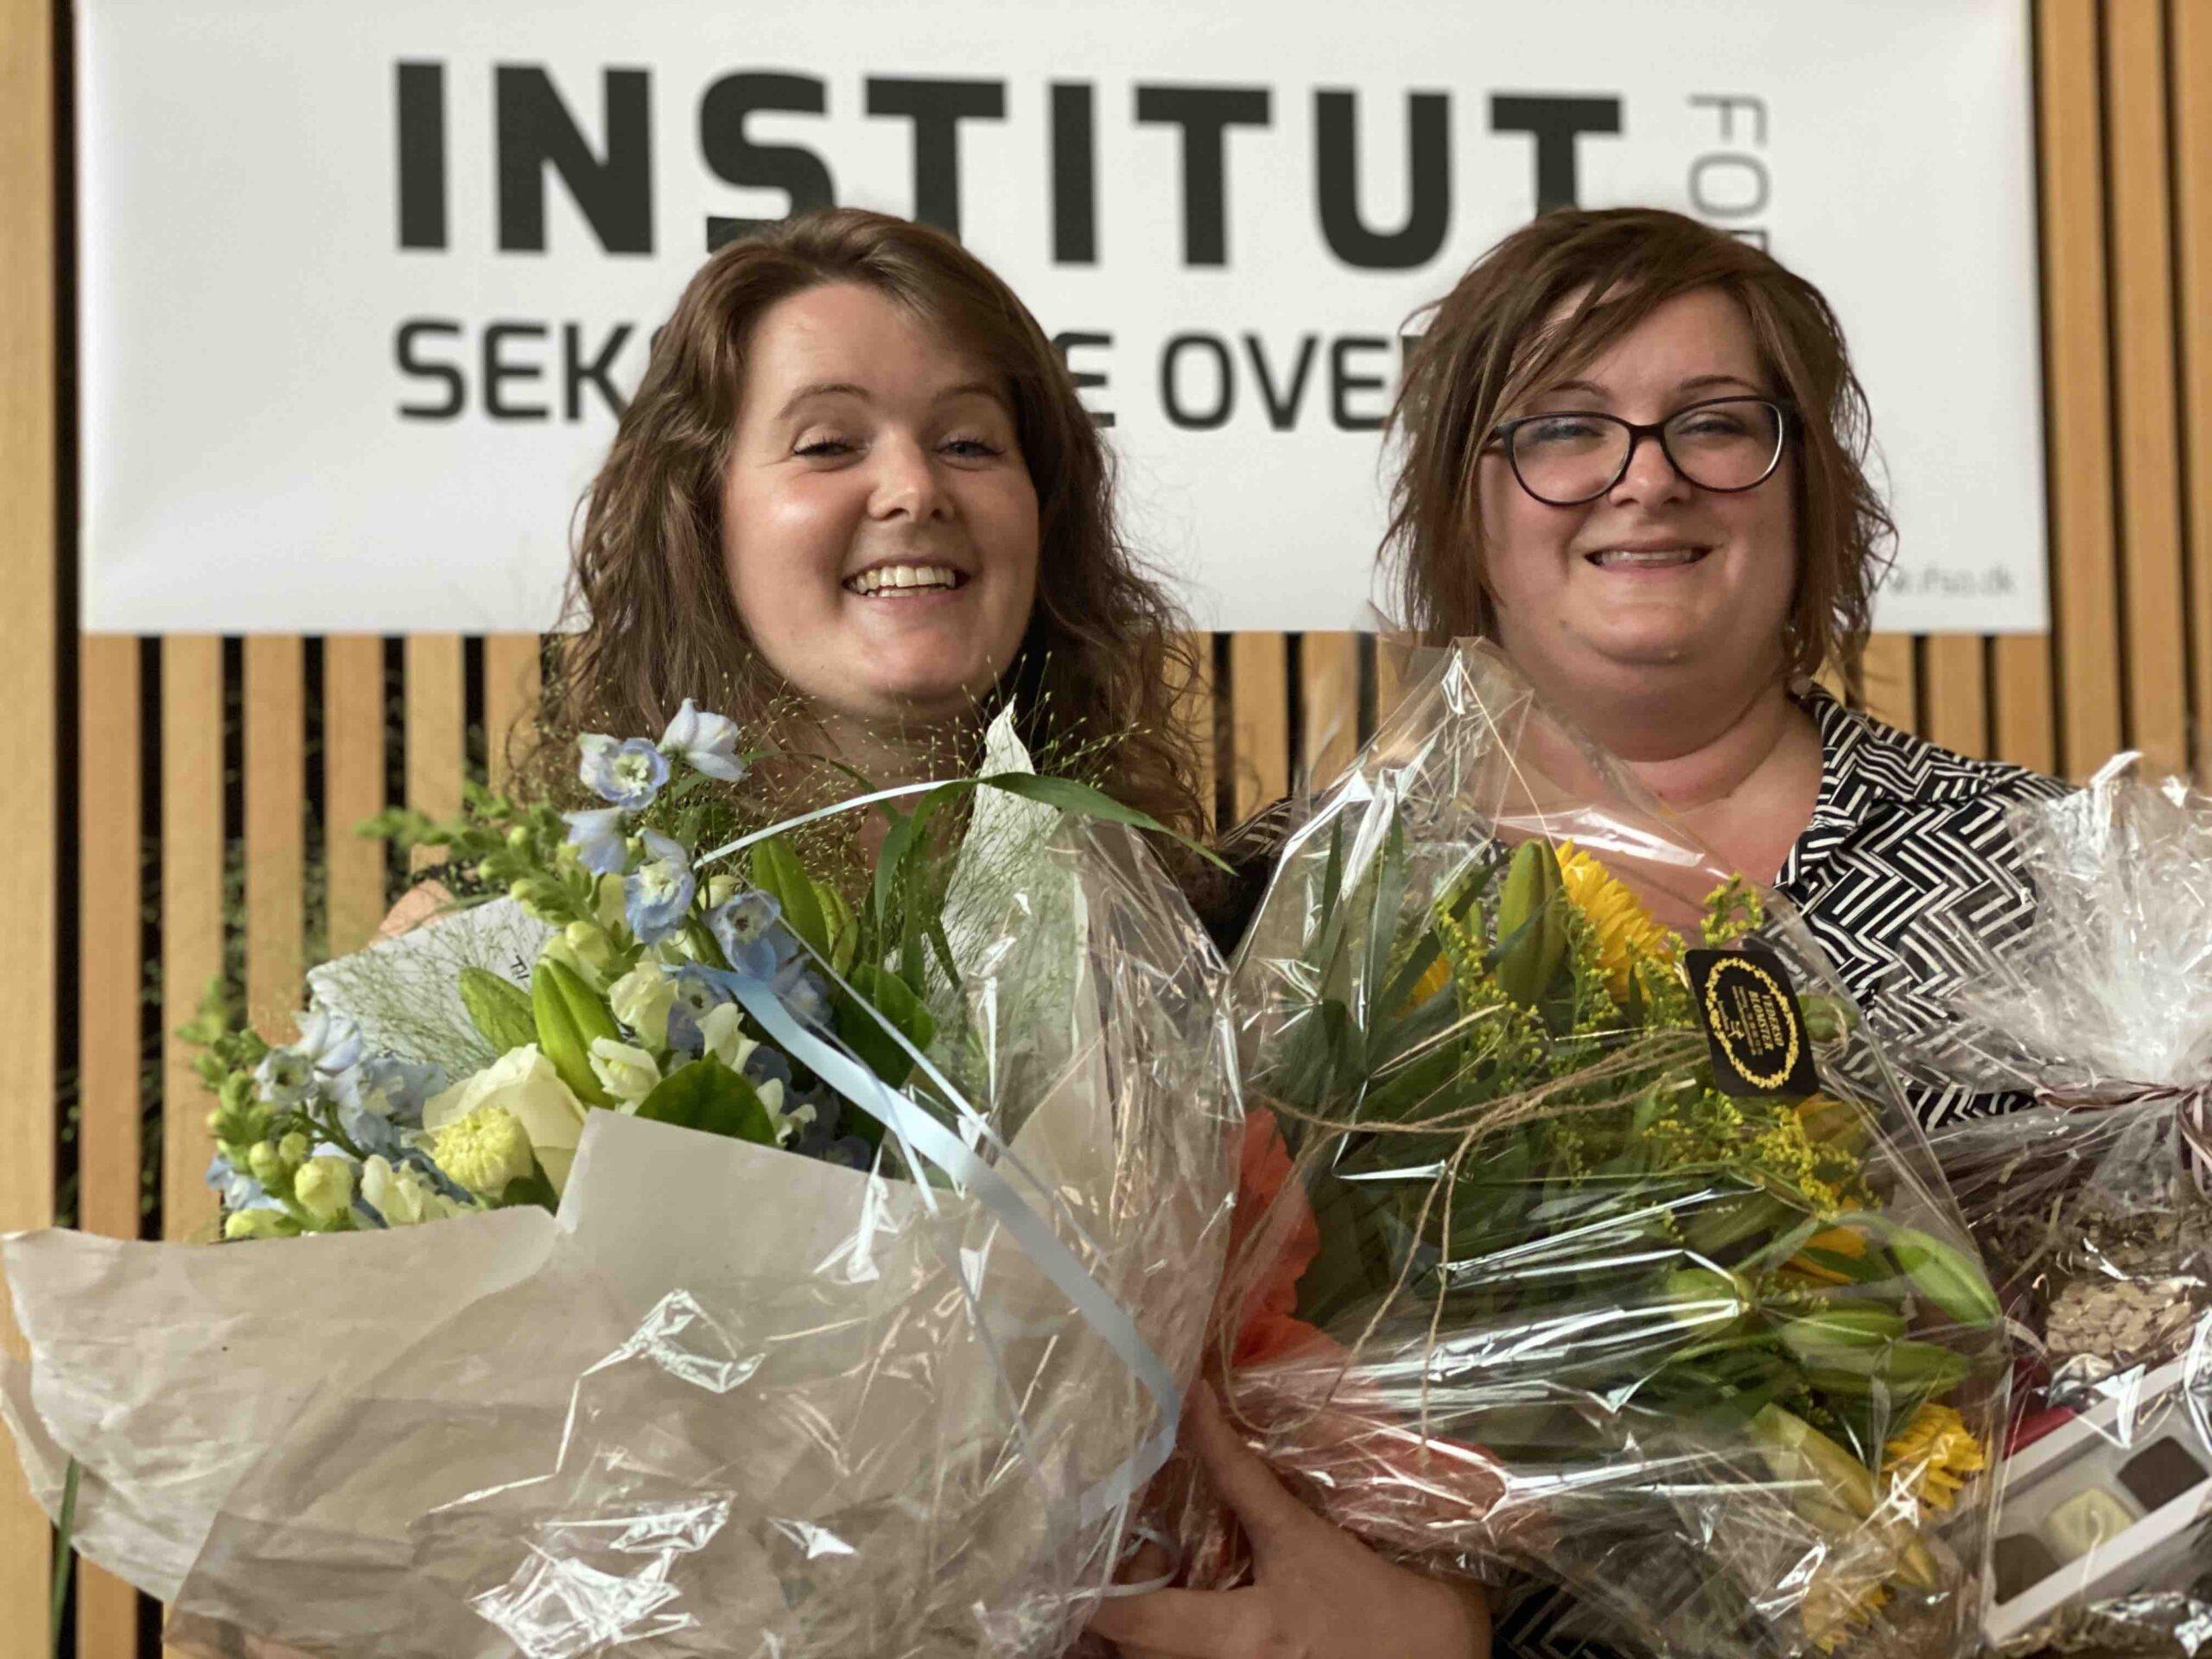 Institut for Seksuelle Overgreb bød velkommen i Sundhedshuset